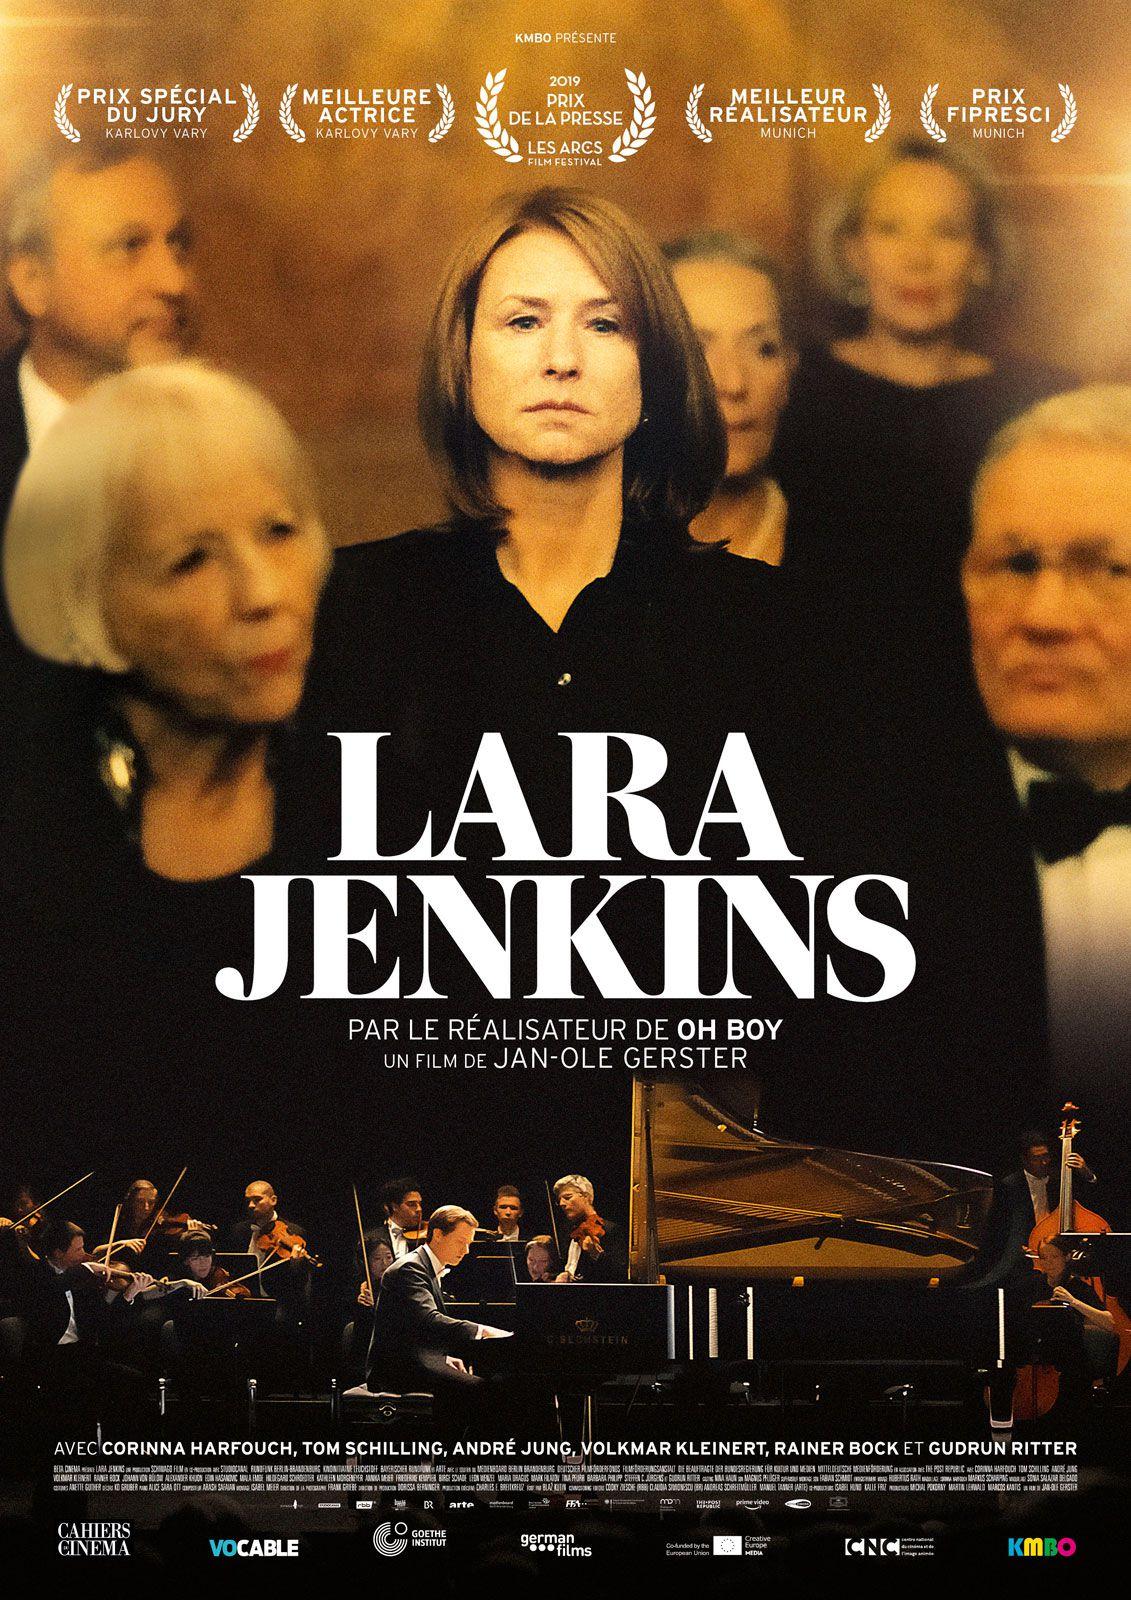 Lara Jenkins - Film (2020)